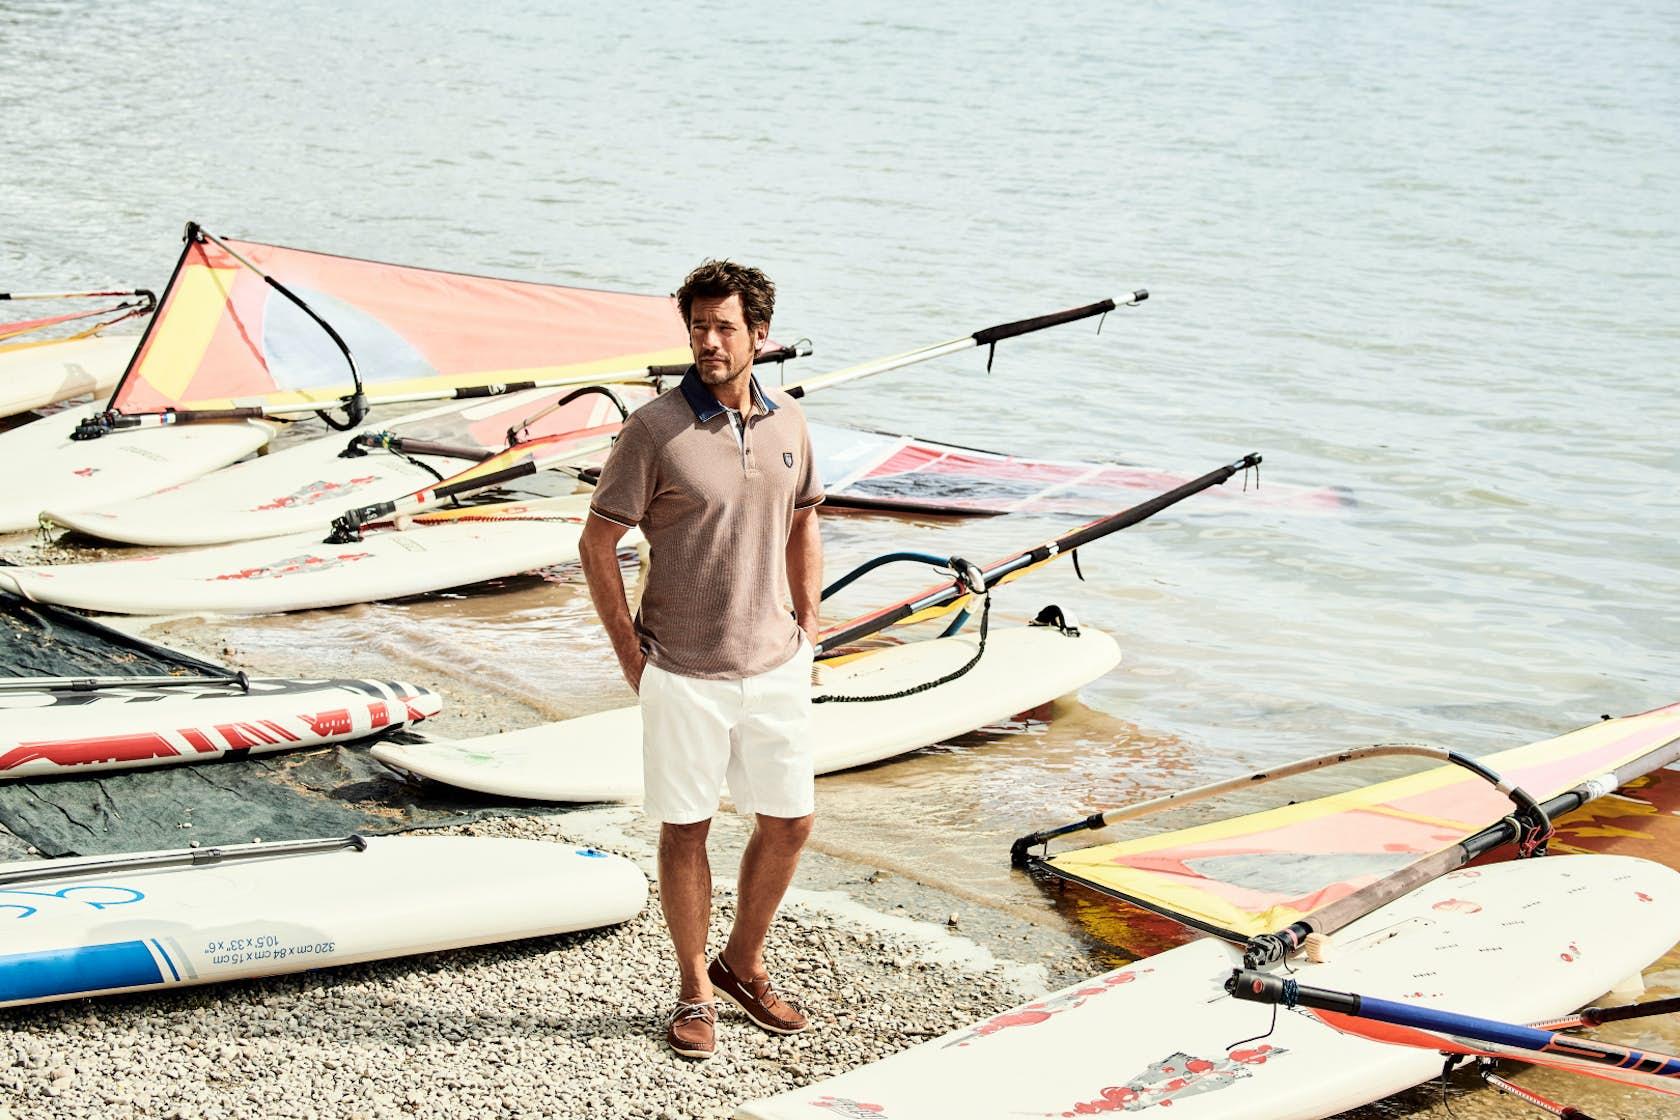 RAGMAN Man of Joy Herren Outfit Poloshirt mit Windsurfing am Strand